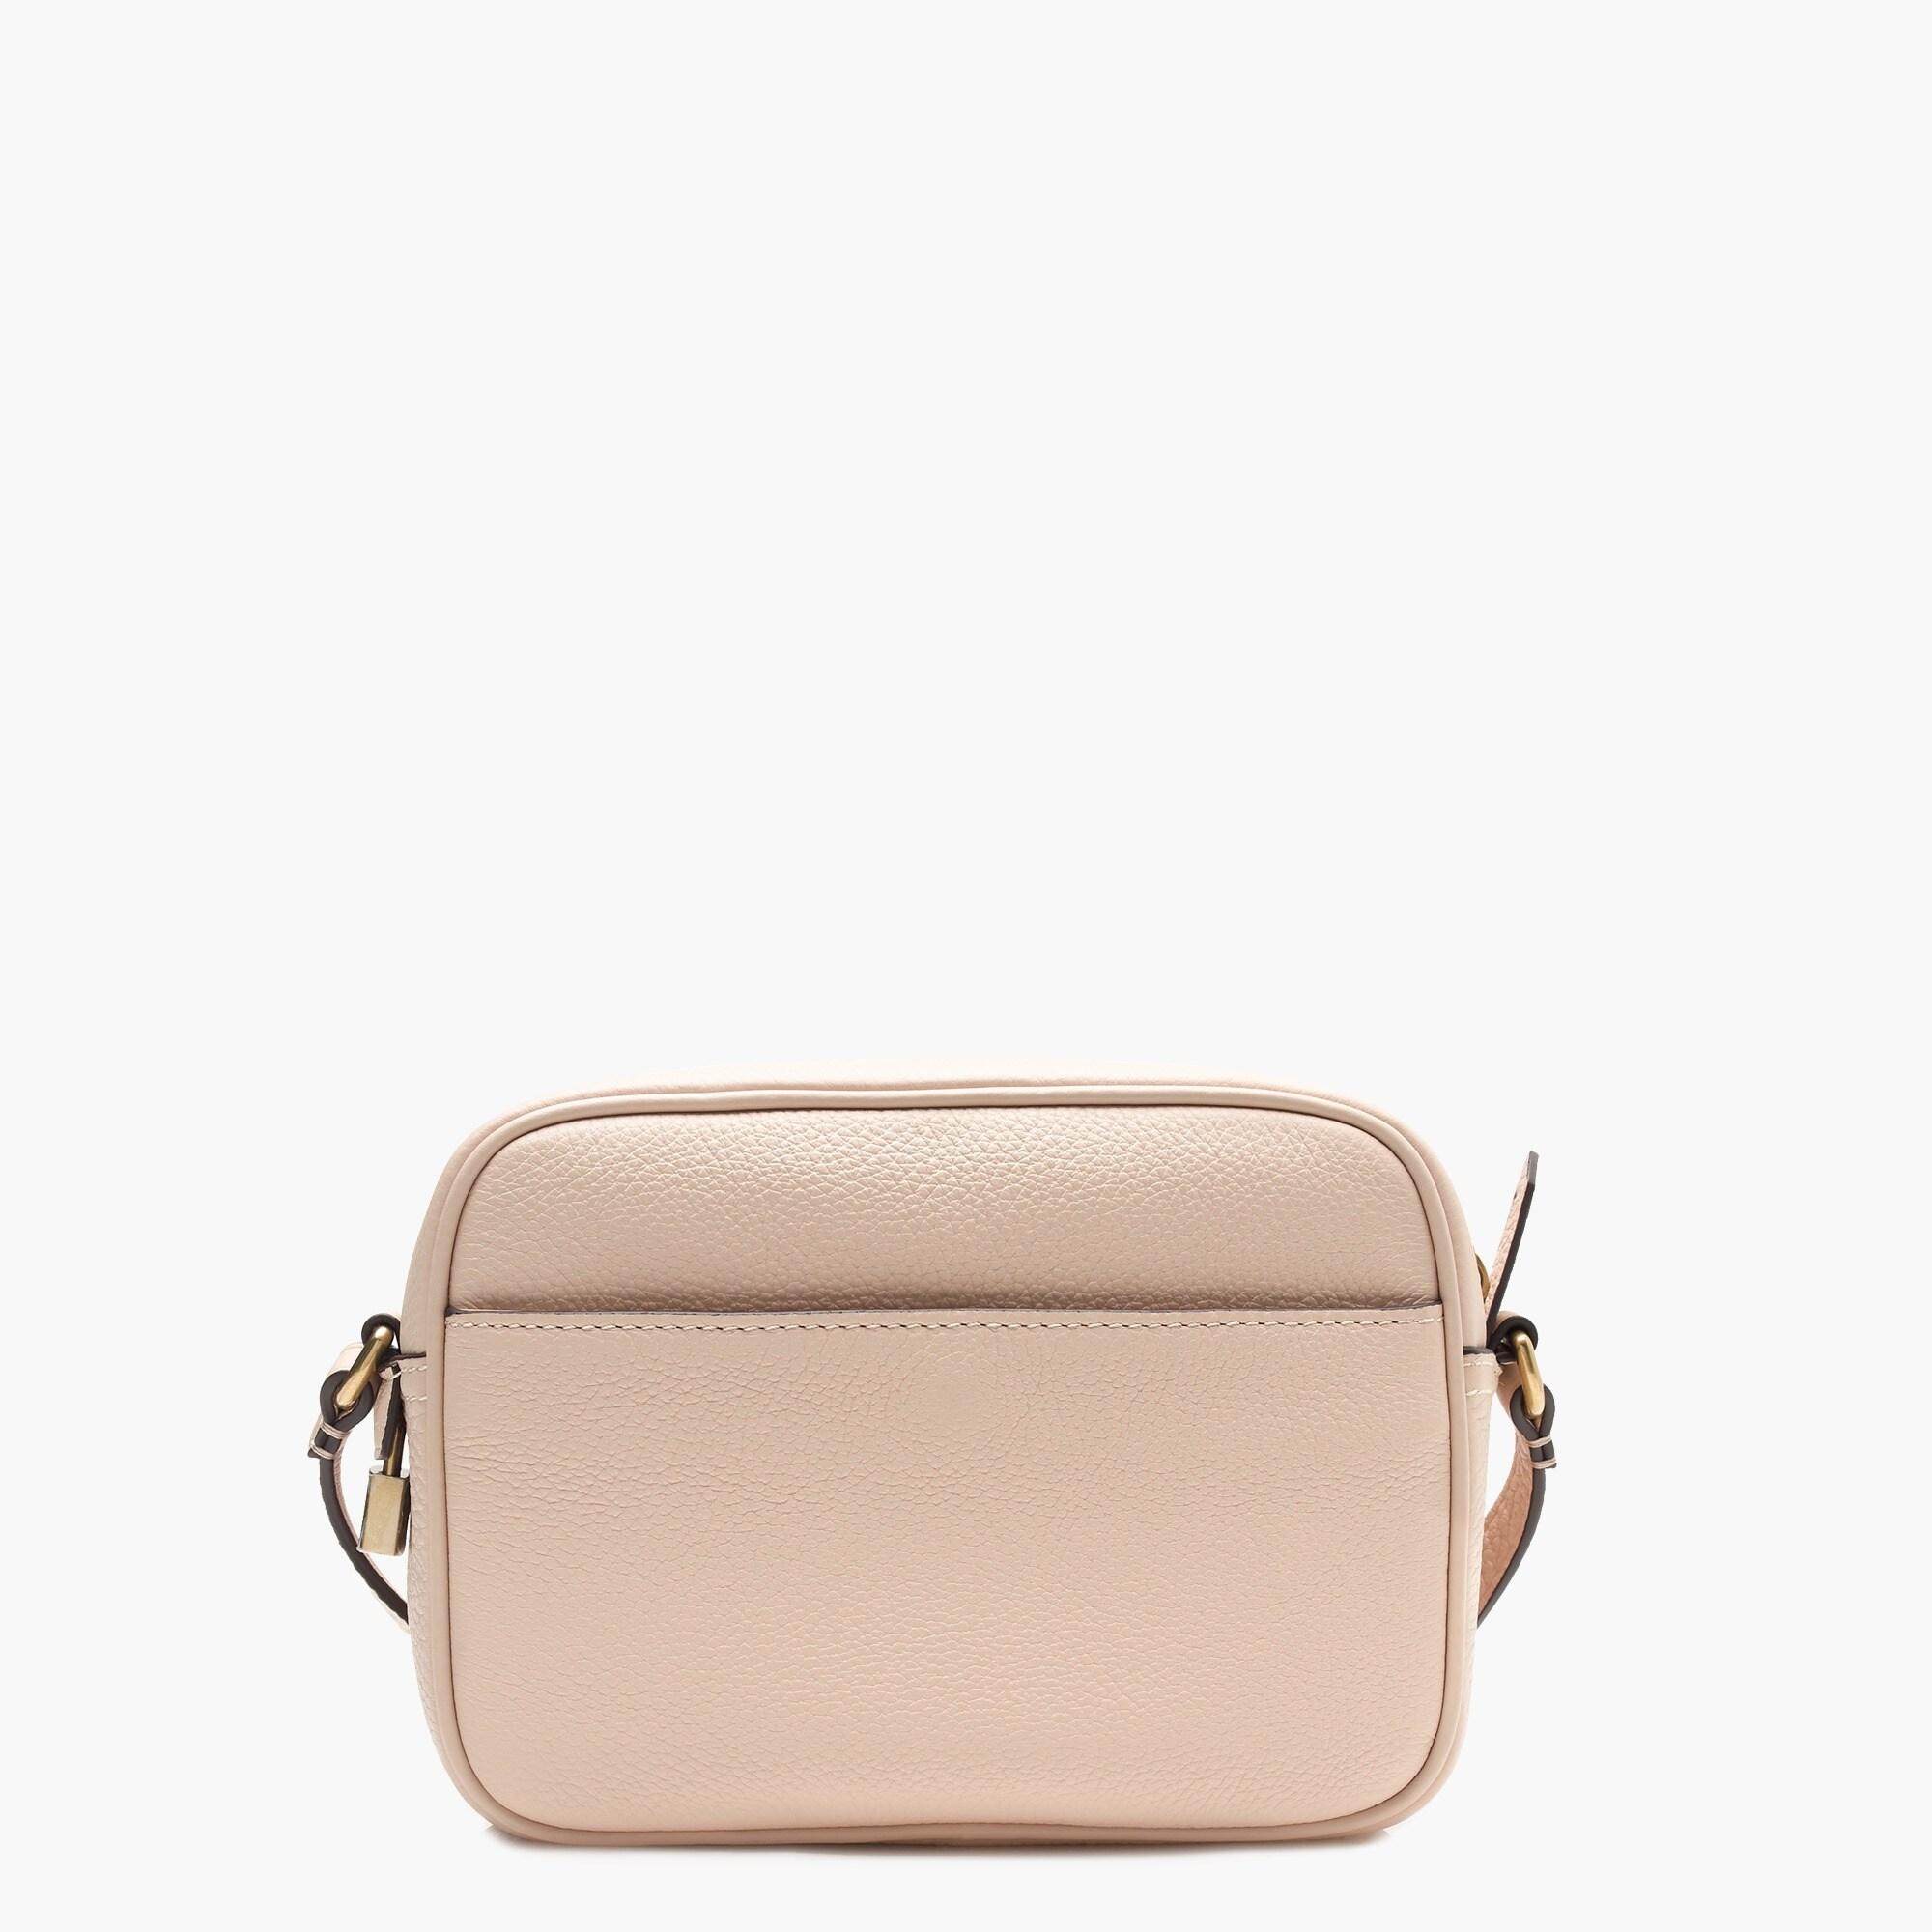 signet bag in italian leather : women's crossbody bags